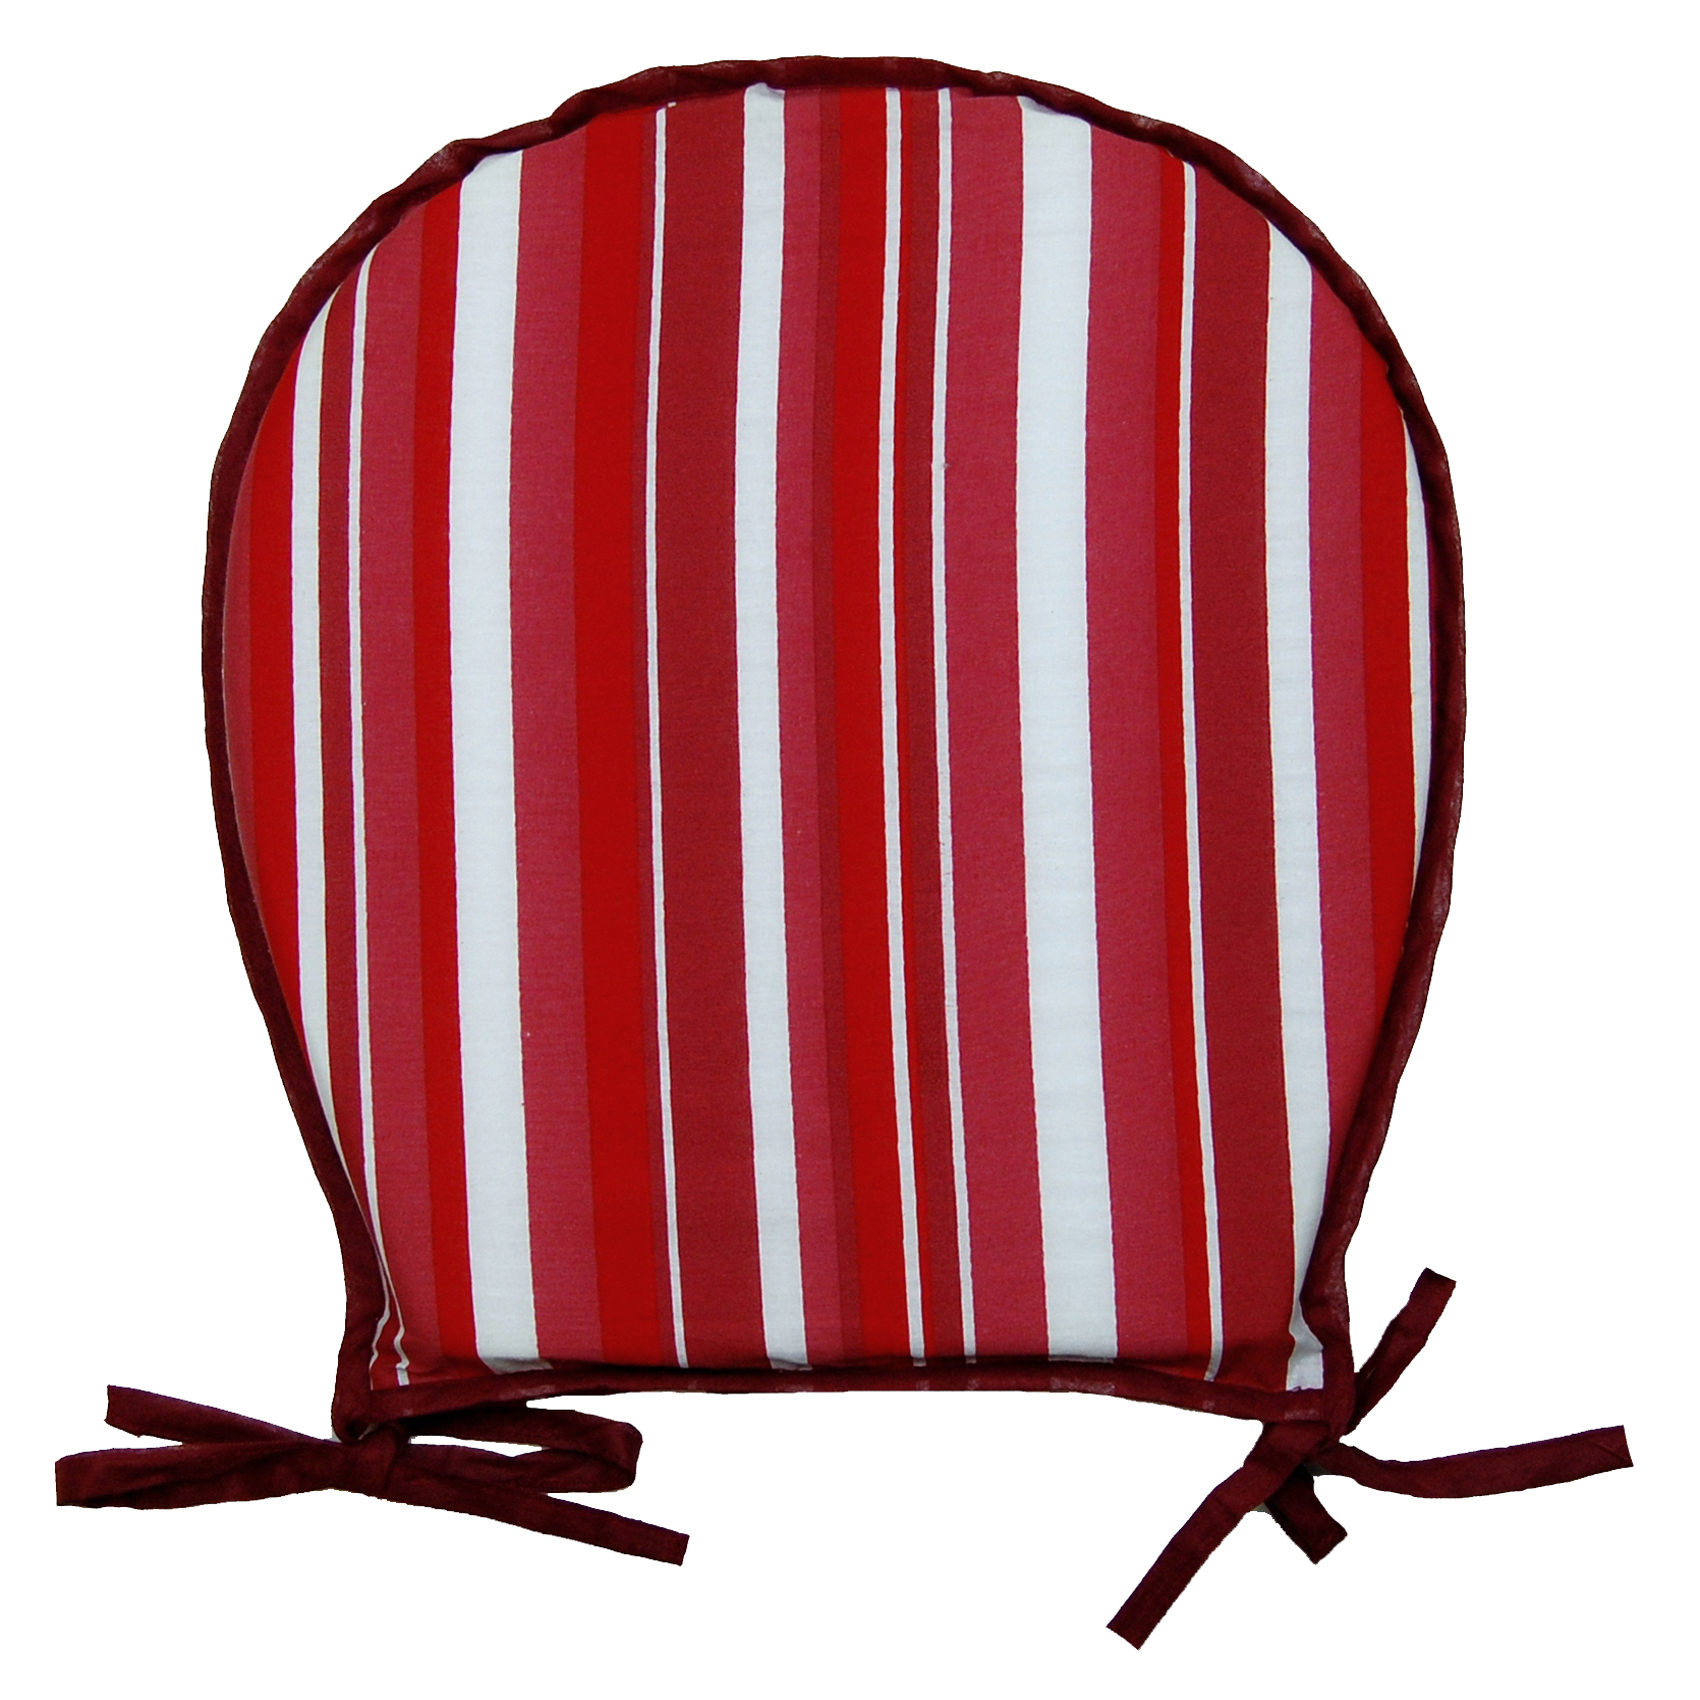 100 Cotton Striped Round Seat Pad Dining Garden